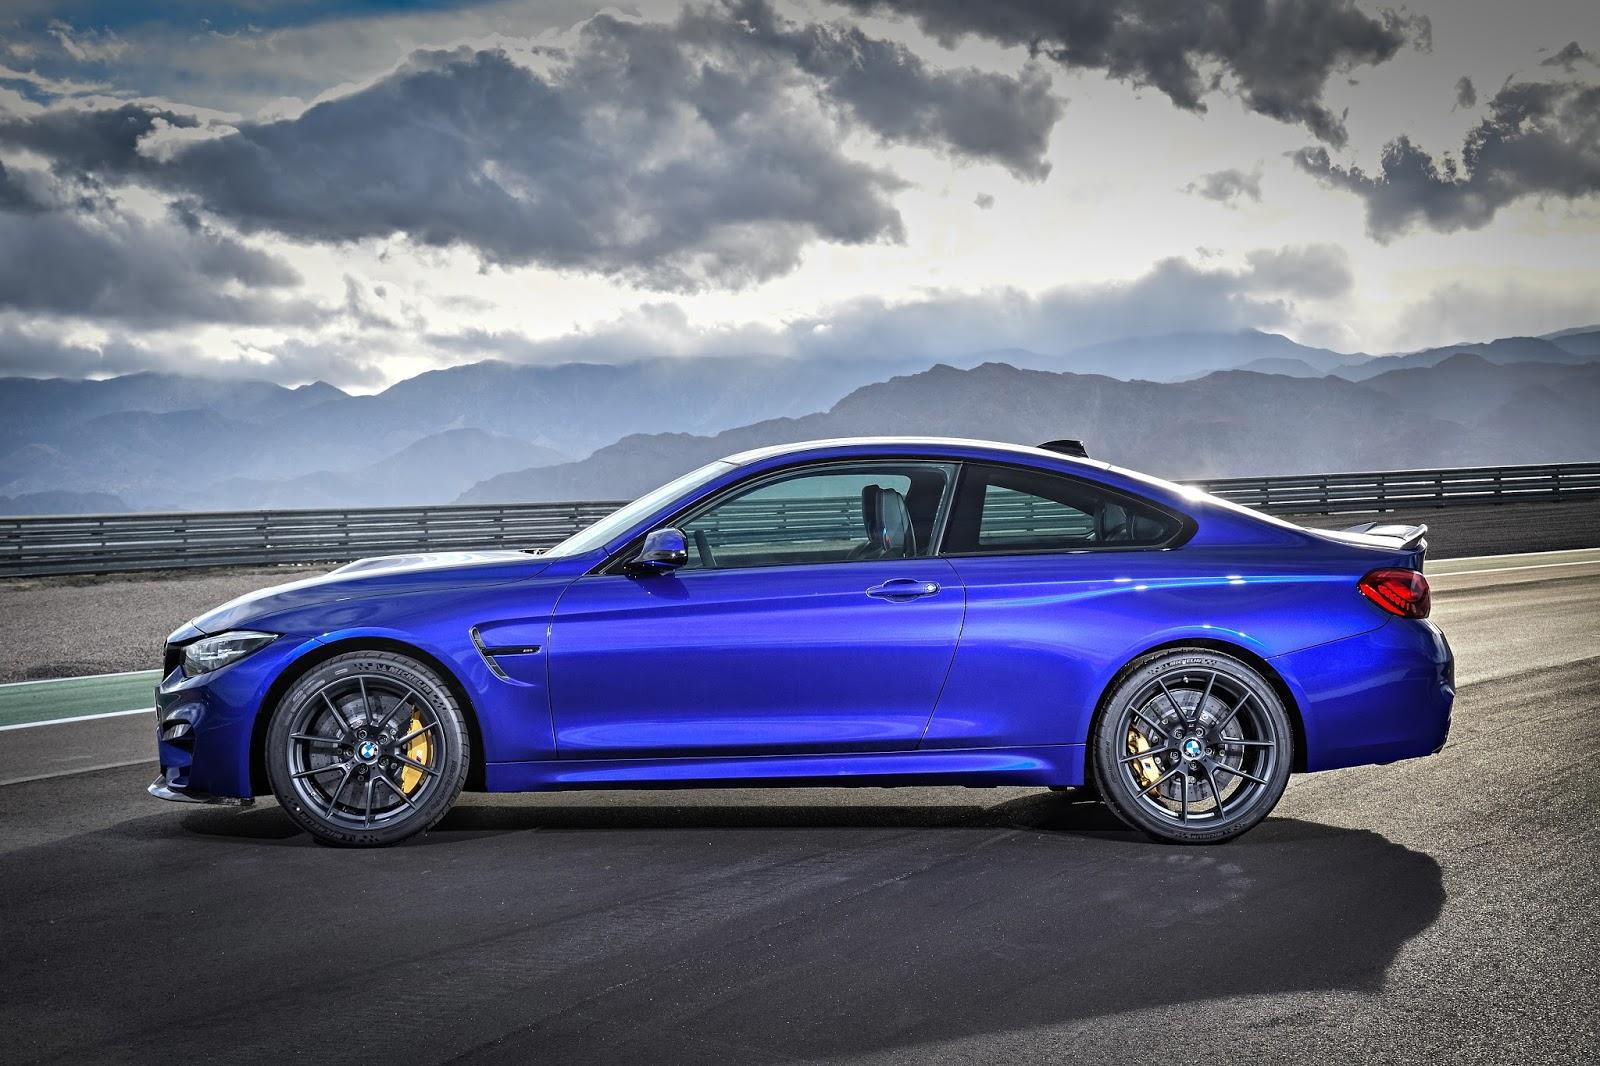 P90251024 highRes the new bmw m4 cs 04 1 Η περιορισμένης παραγωγής BMW M4 ClubSport δική σας με 116.900 ευρώ BMW, BMW M, BMW M4, BMW M4 CS, BMW Motorsport, clubsport, COUPE, Limited edition, supercars, supersport, videos, Περιορισμένης παραγωγής